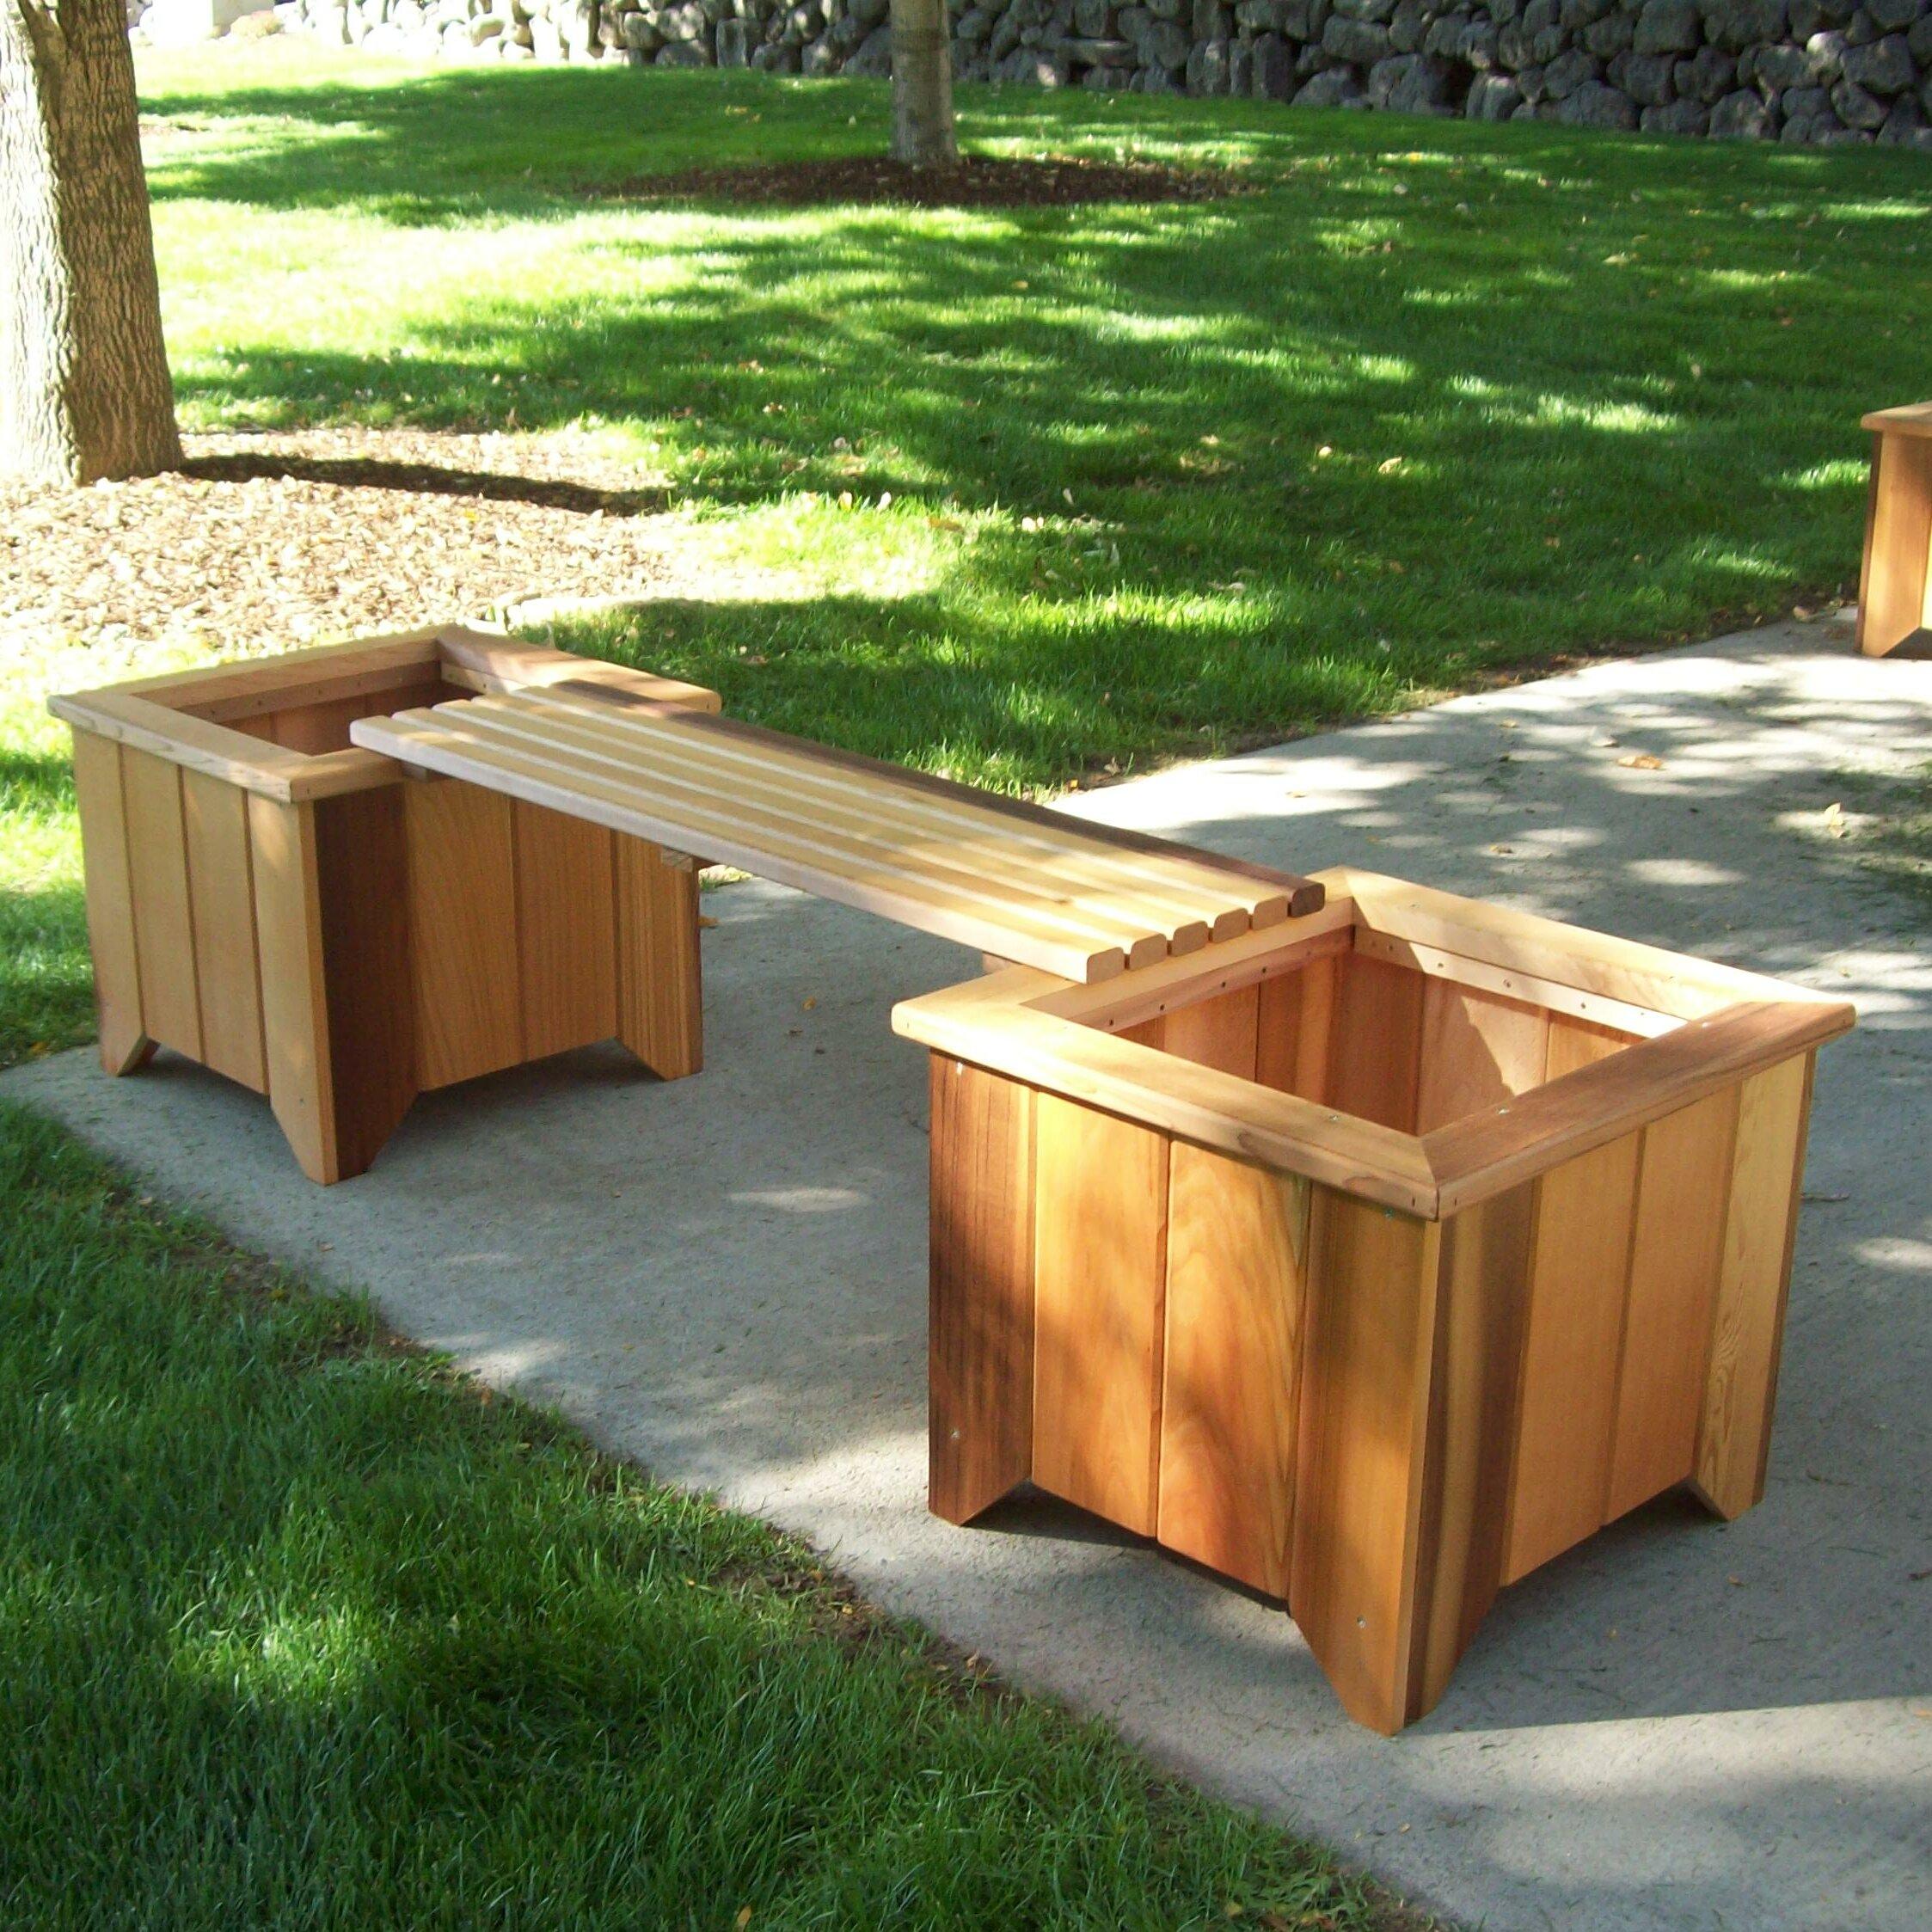 Woodcountry Wood Planter Bench Reviews Wayfair Ca